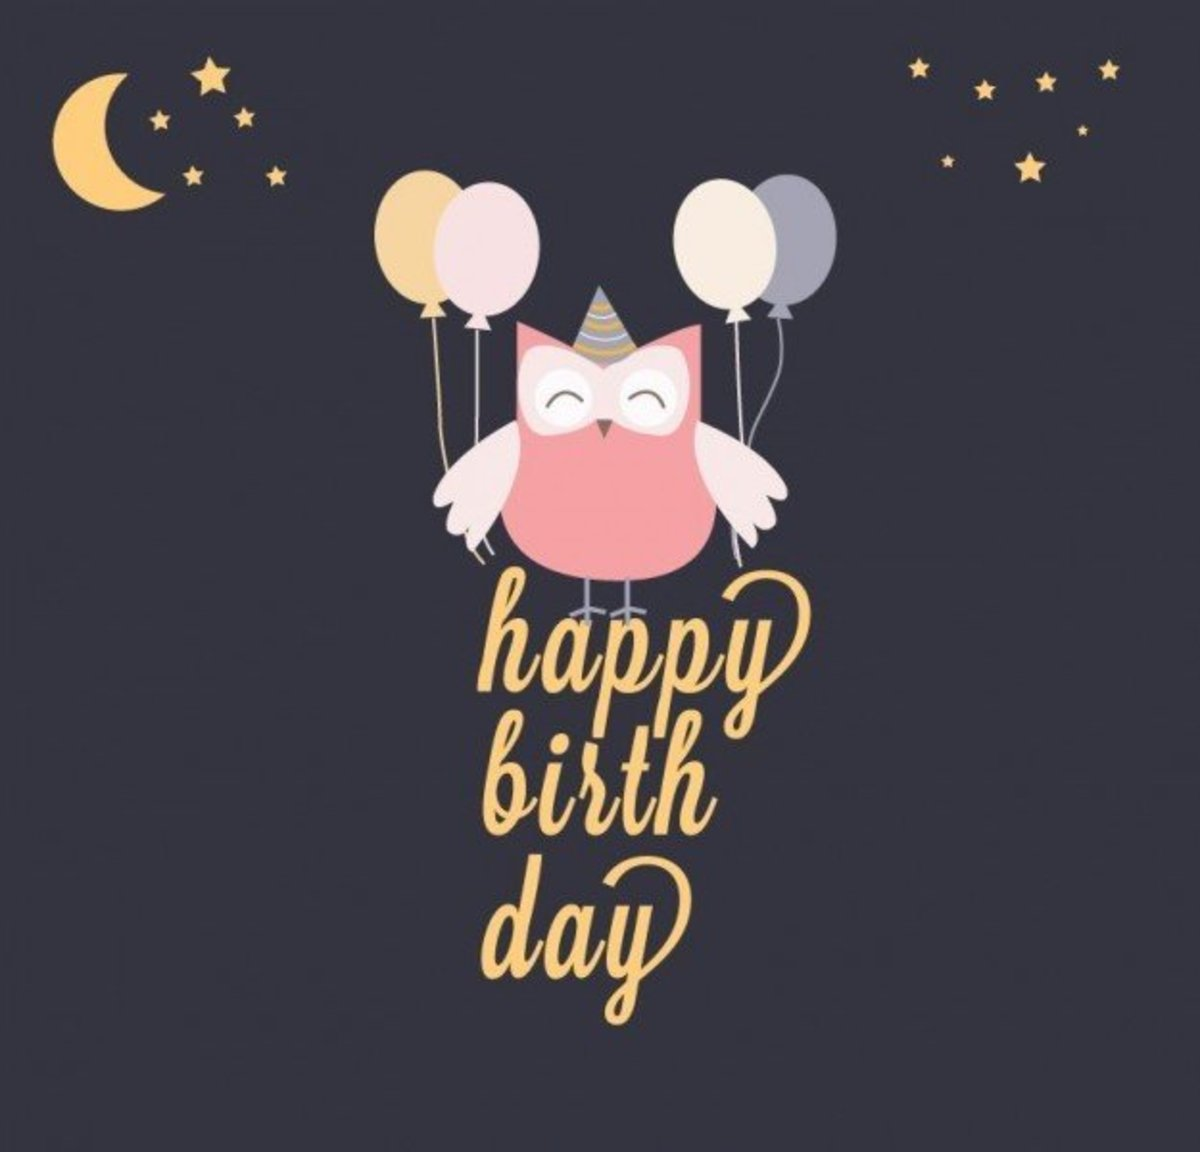 Happy Birthday with Owl